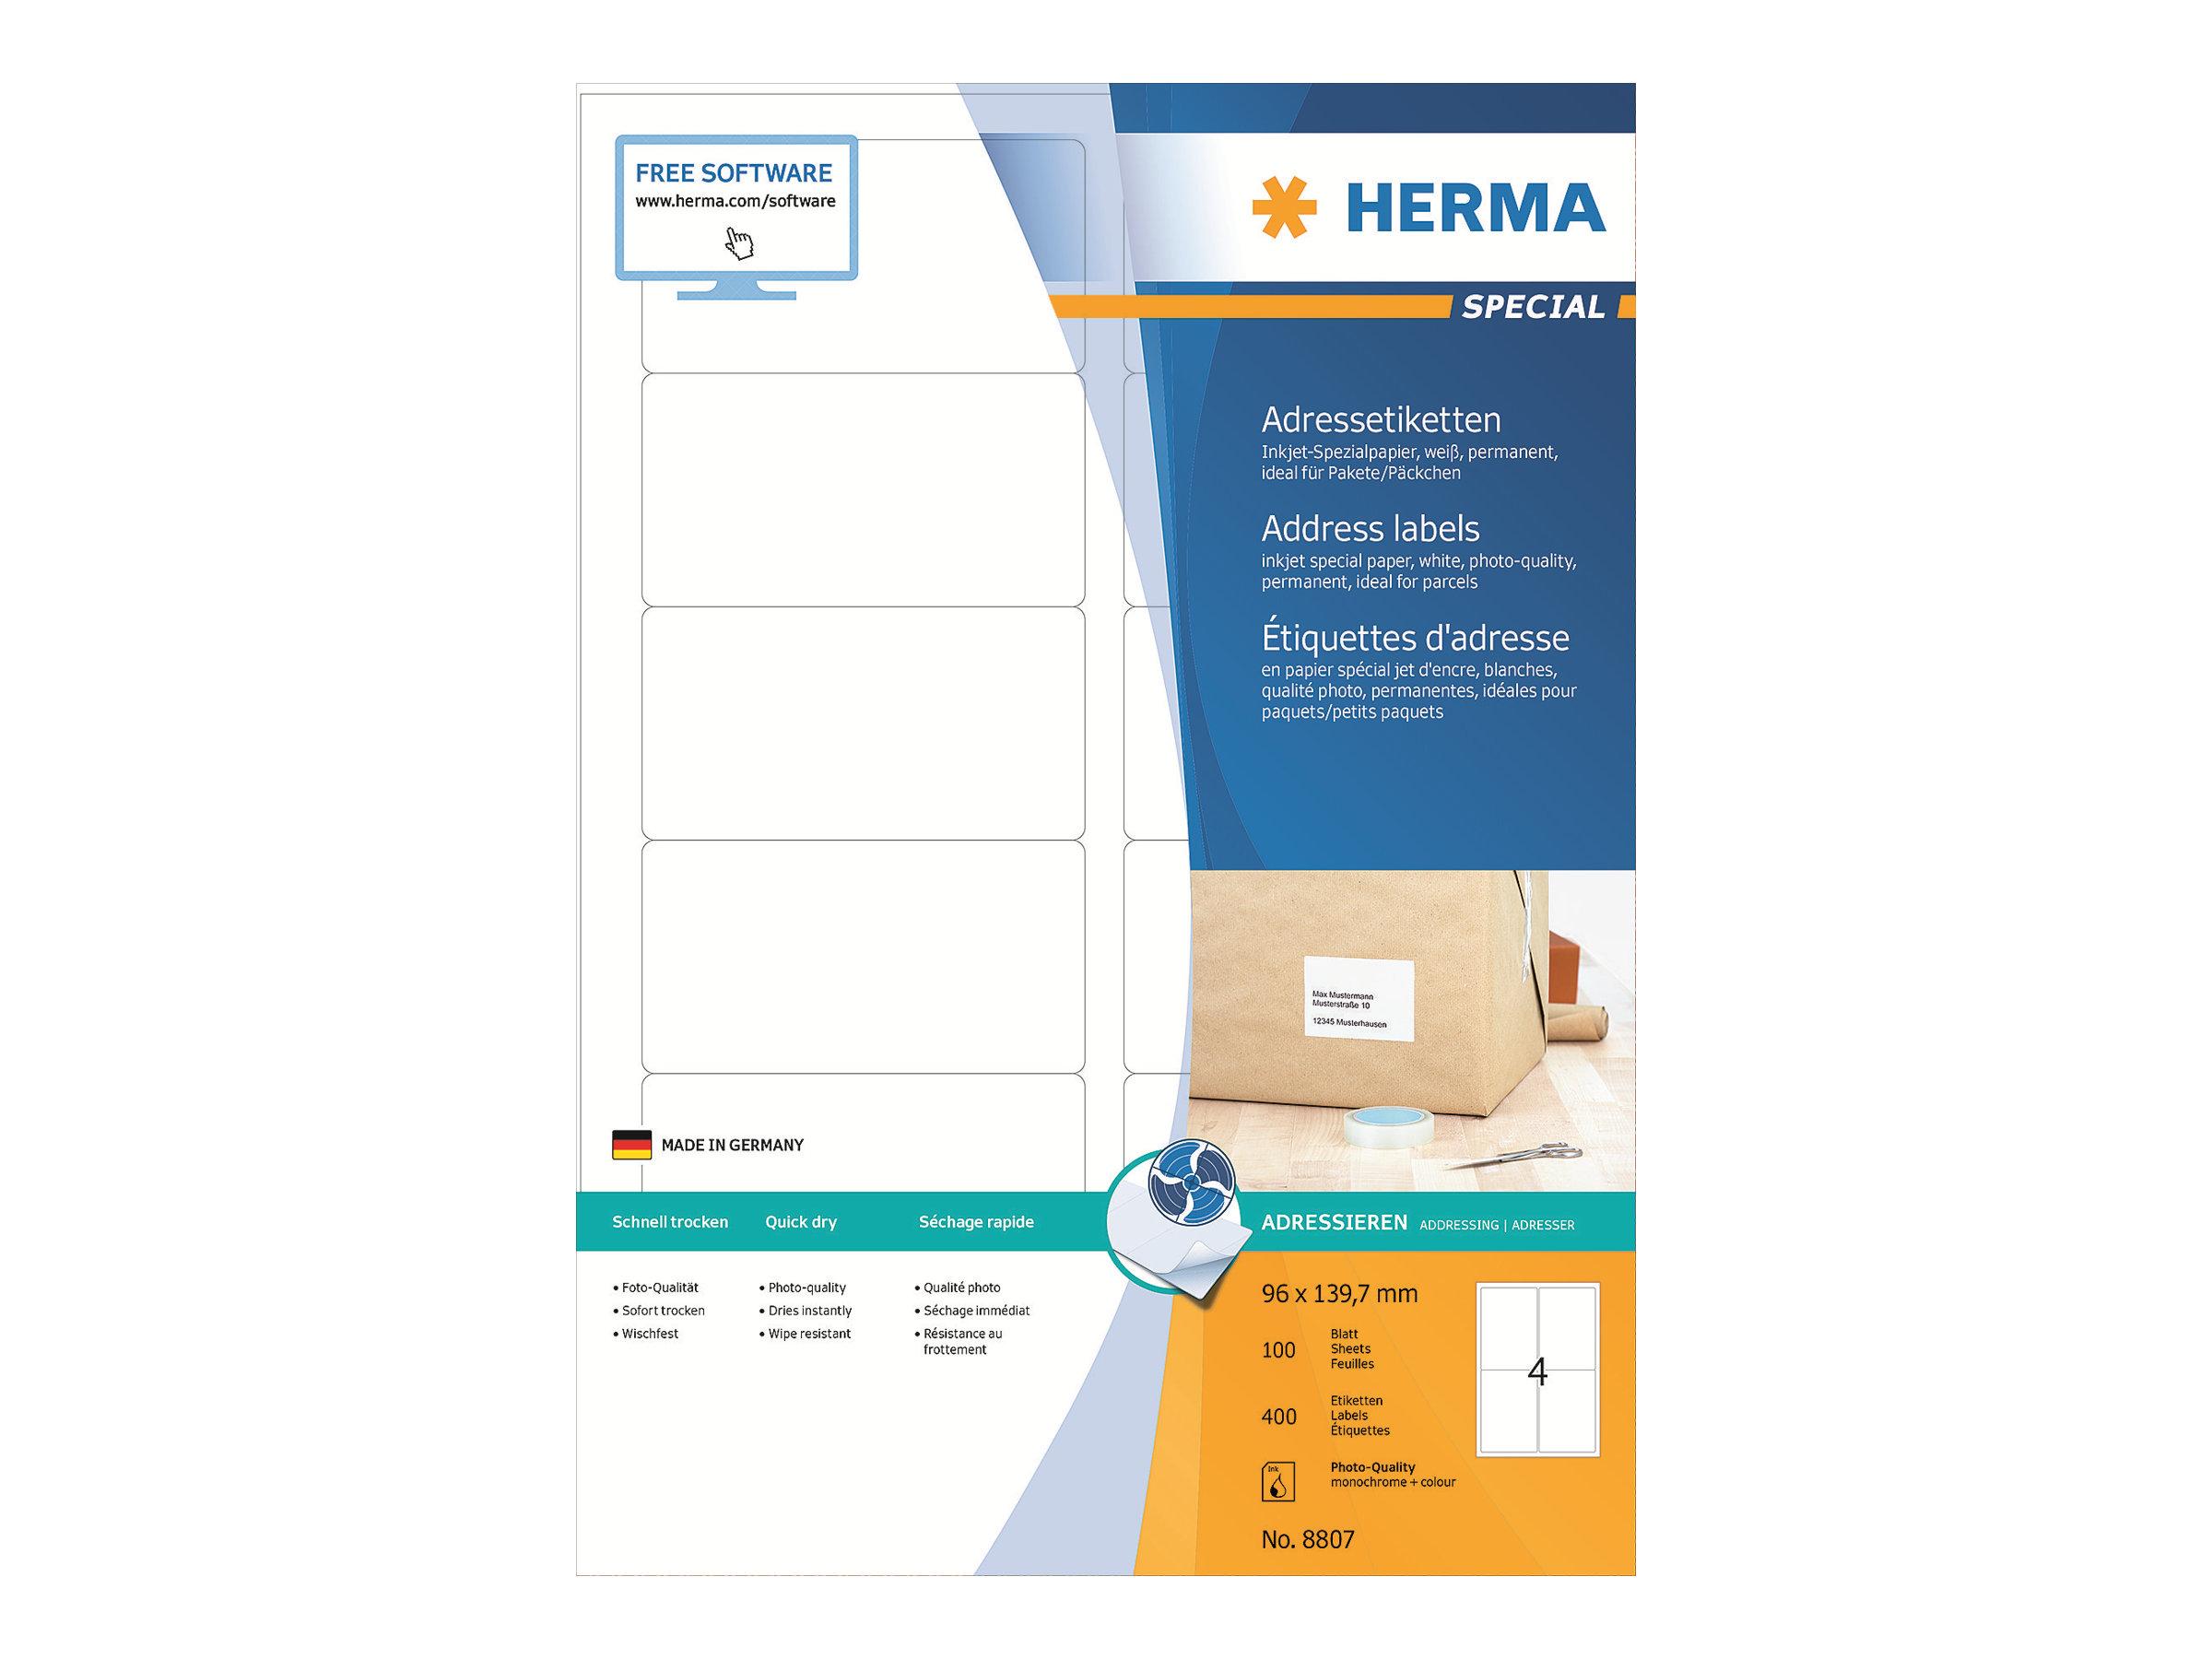 HERMA Special - Papier - matt - permanent selbstklebend - beschichtet - weiß - 96 x 139.7 mm - 90 g/m² - 400 Etikett(en) (100 Bogen x 4)